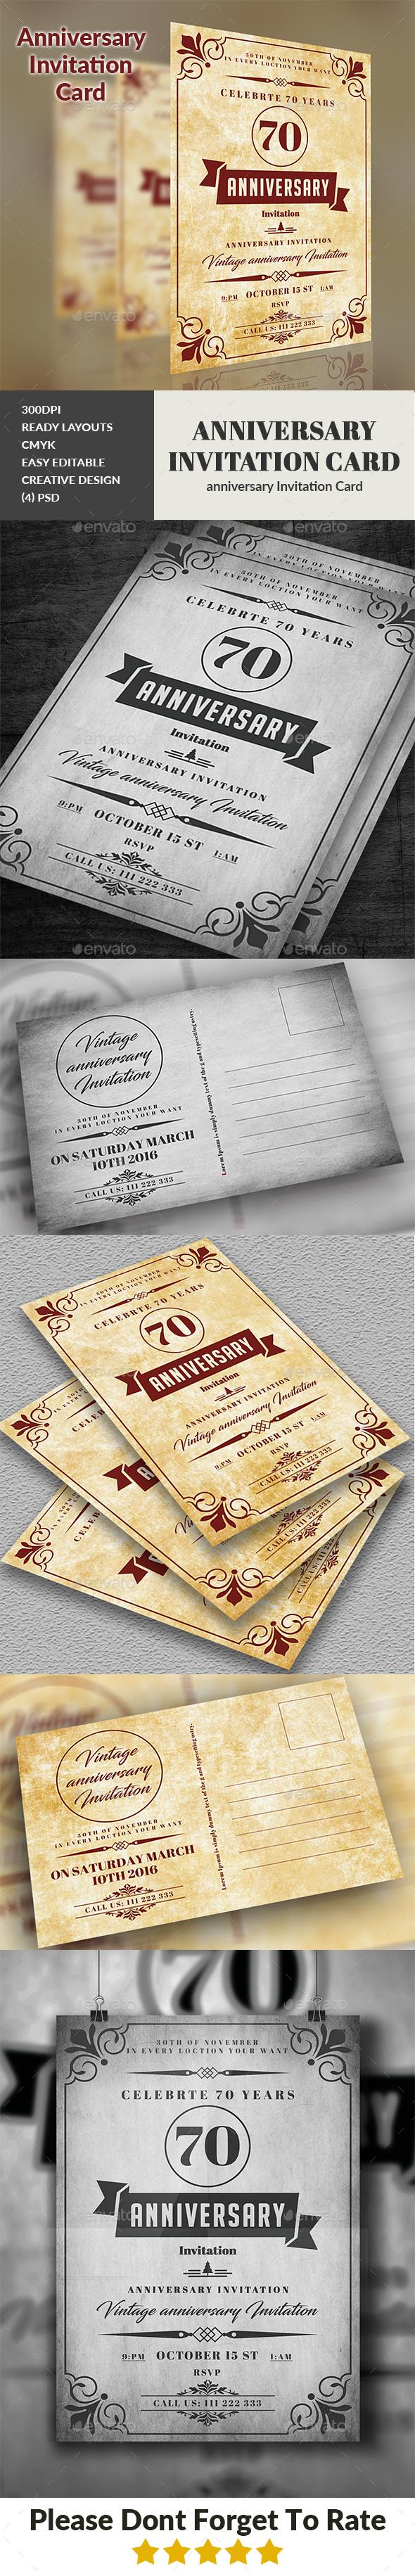 Anniversary Invitation Card - Cards & Invites Print Templates